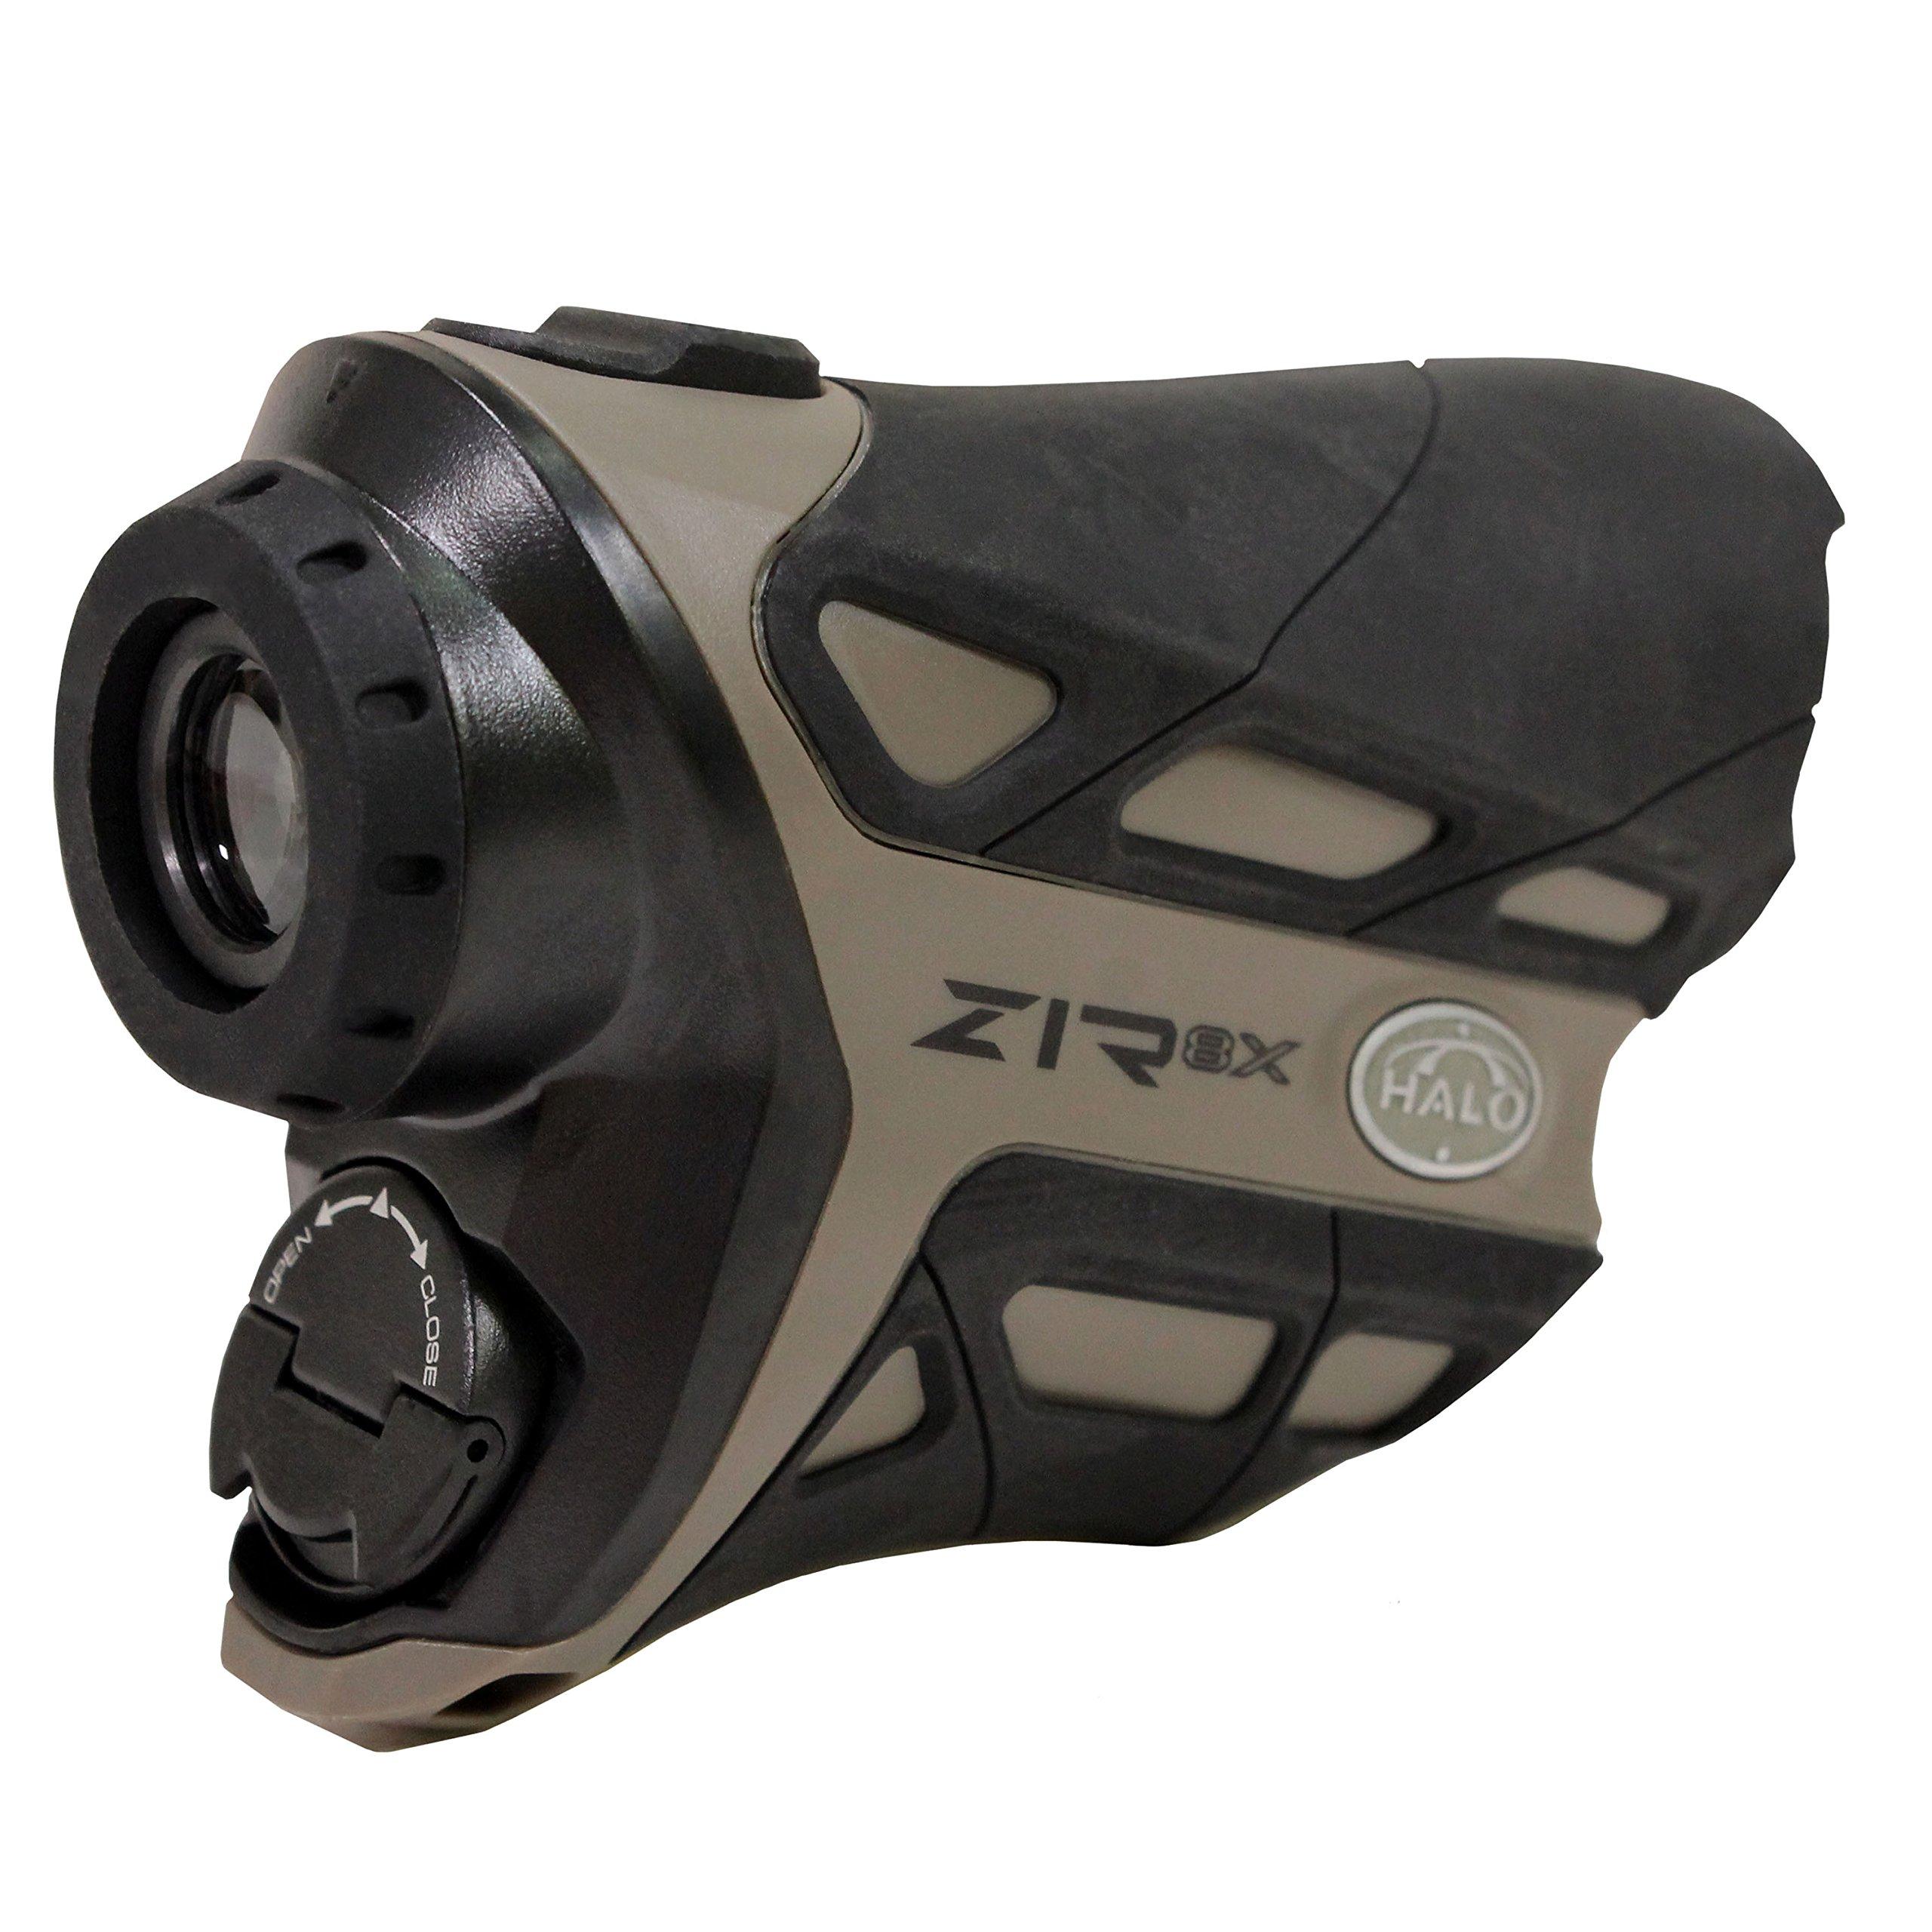 Halo ZIR8X-7 Rangefinder by Halo (Image #1)